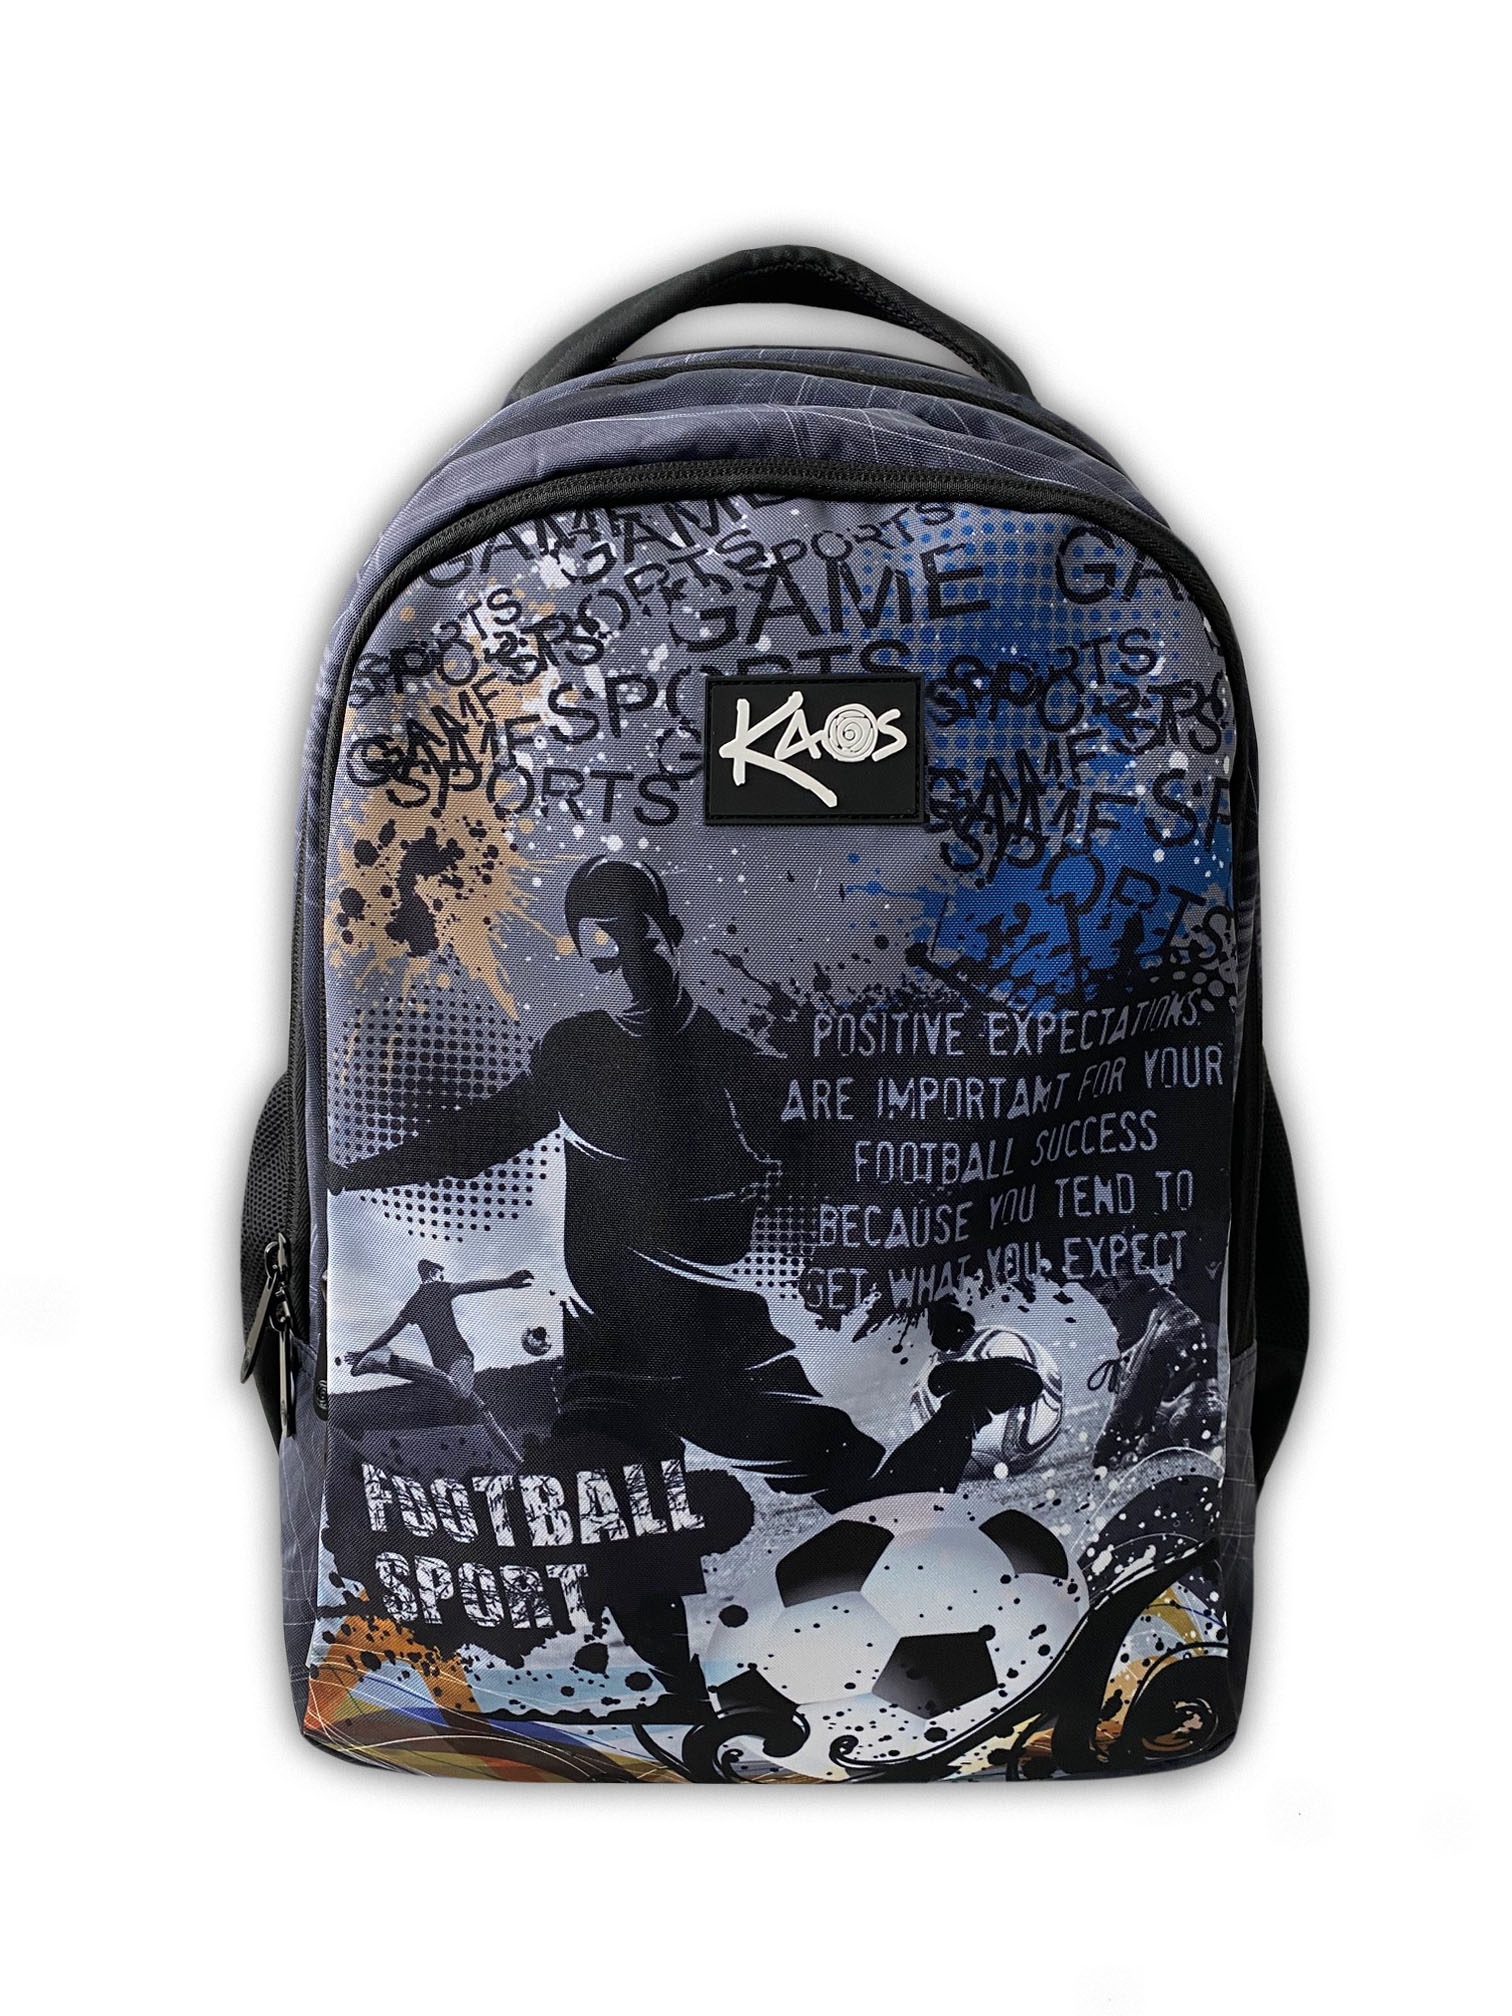 KAOS - Backpack 2-in-1 (36L) - Football Sport (47342)